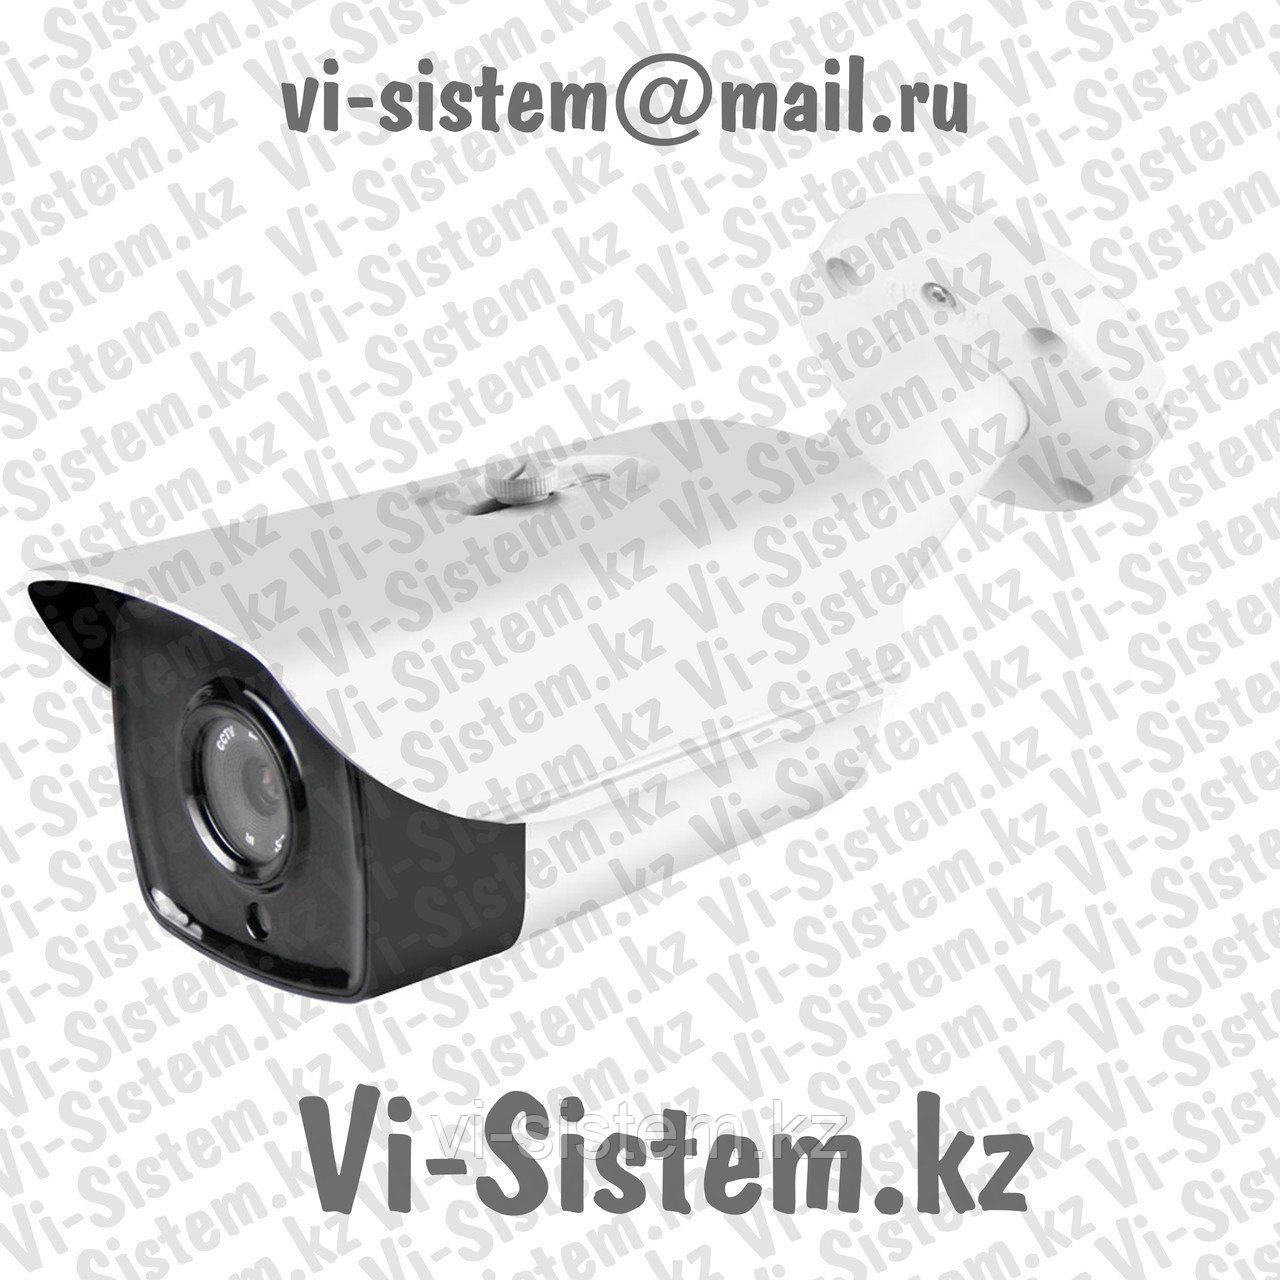 AHD-Видеокамера SYNCAR SY-8915 2MP